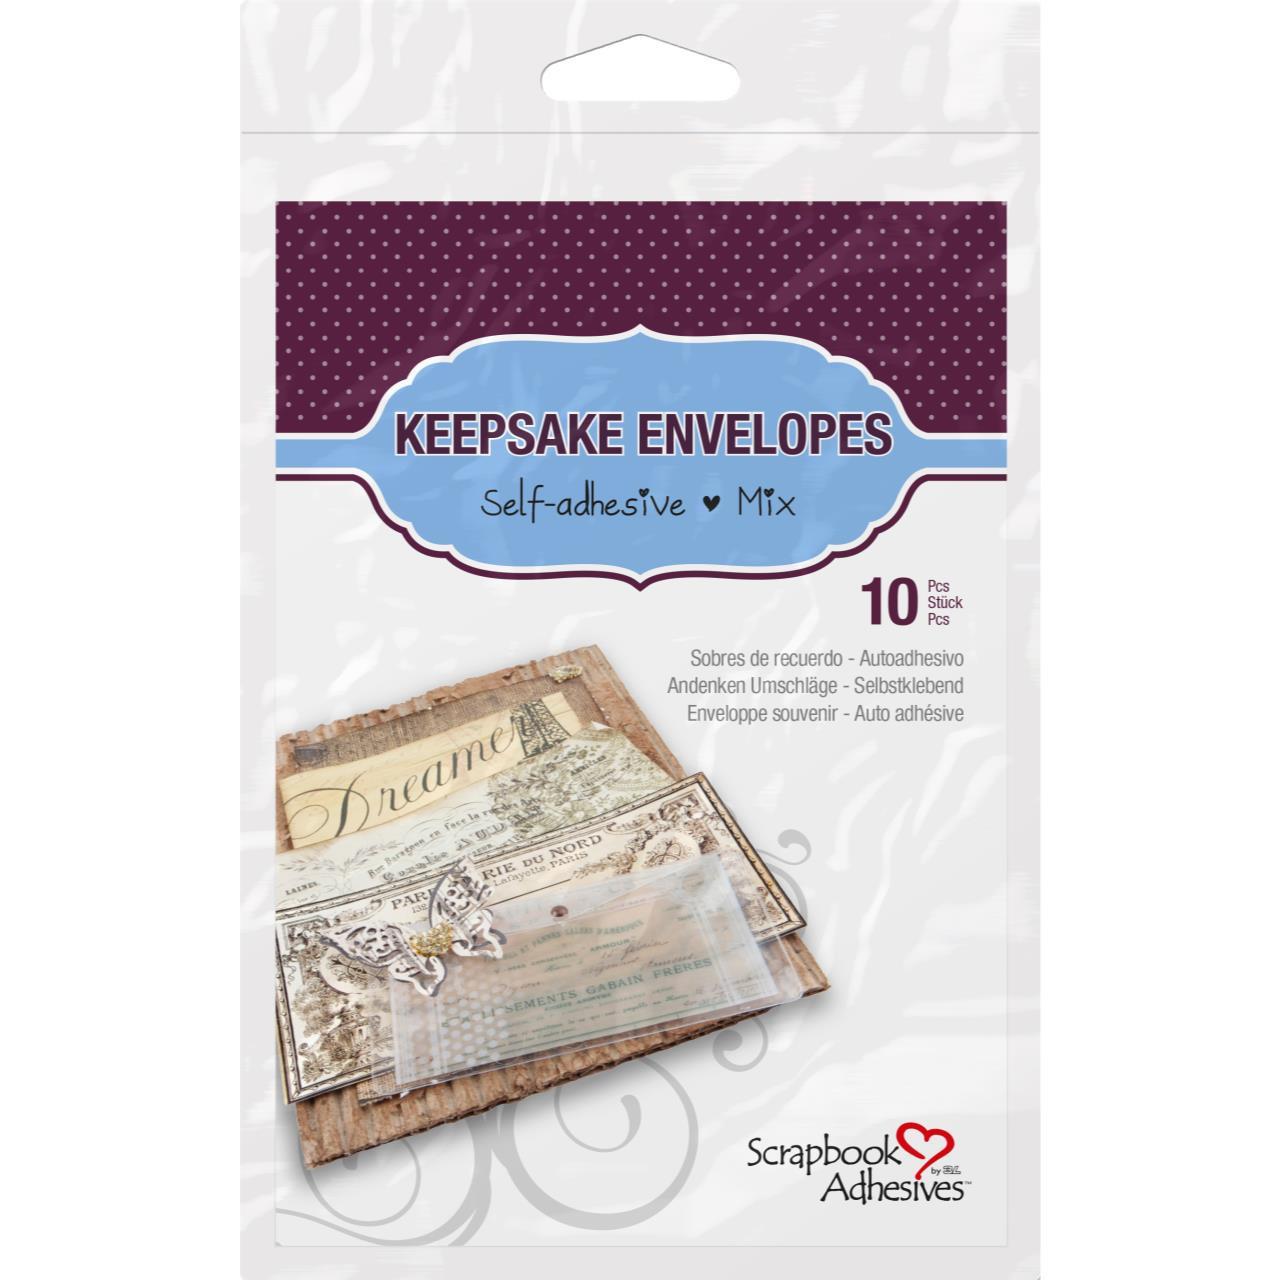 Scrapbook Adhesives Keepsake Envelopes, Assorted -